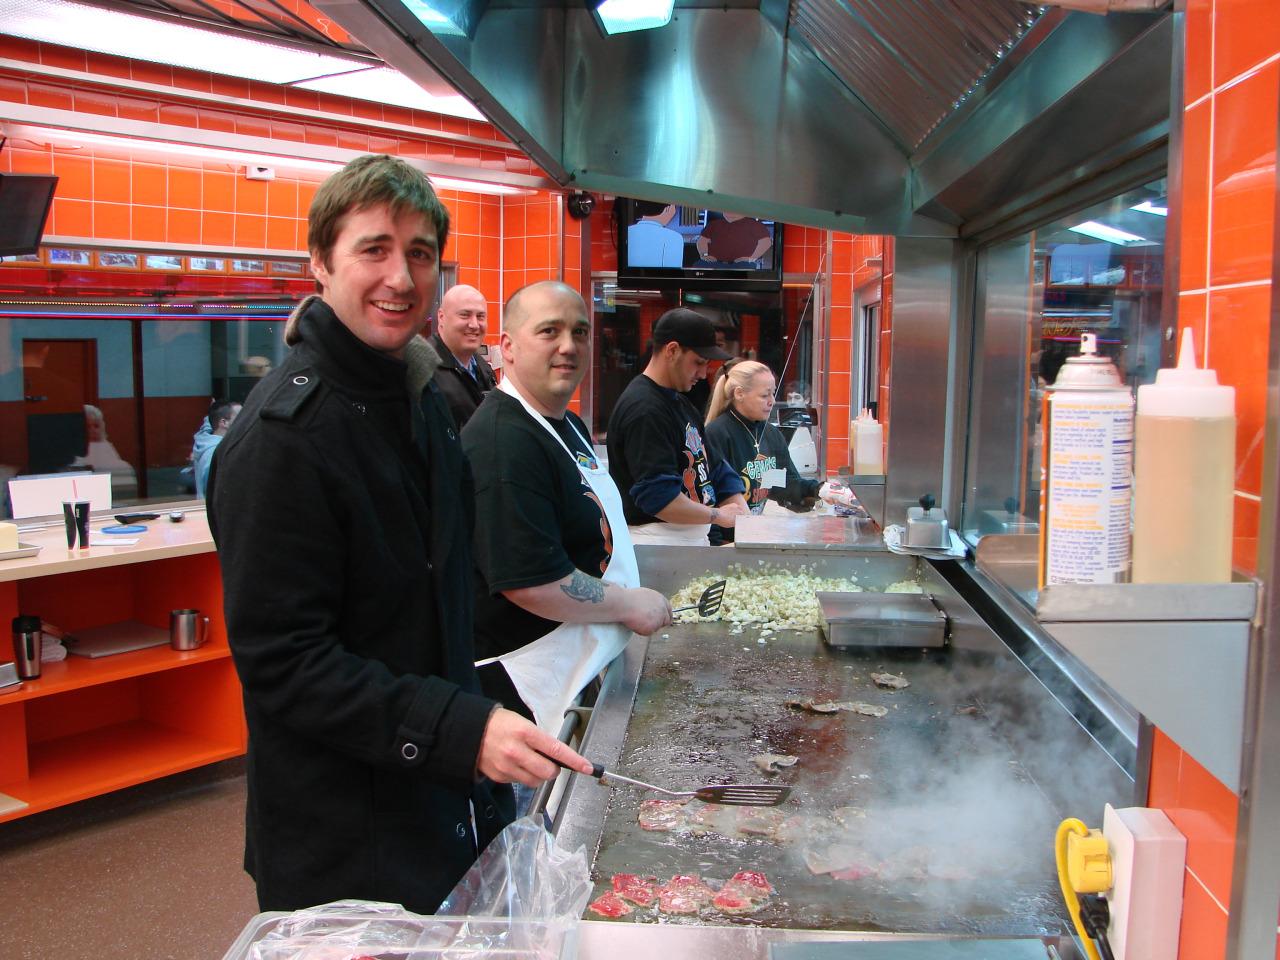 Luke Wilson at Geno's Steaks